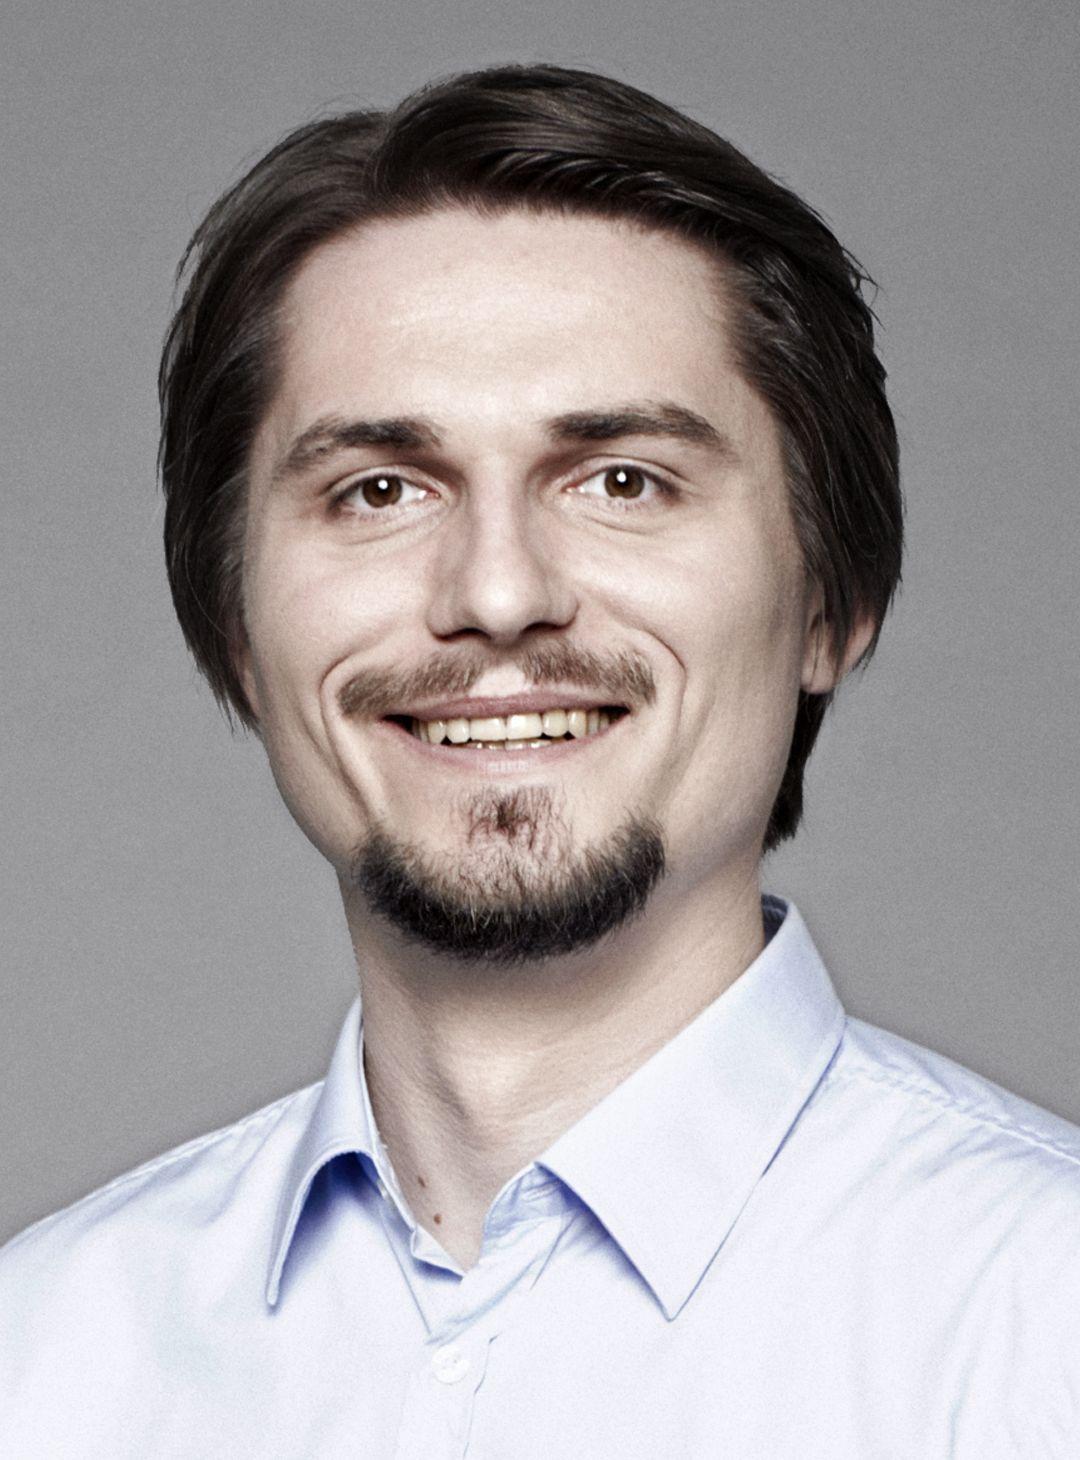 Martin Klose